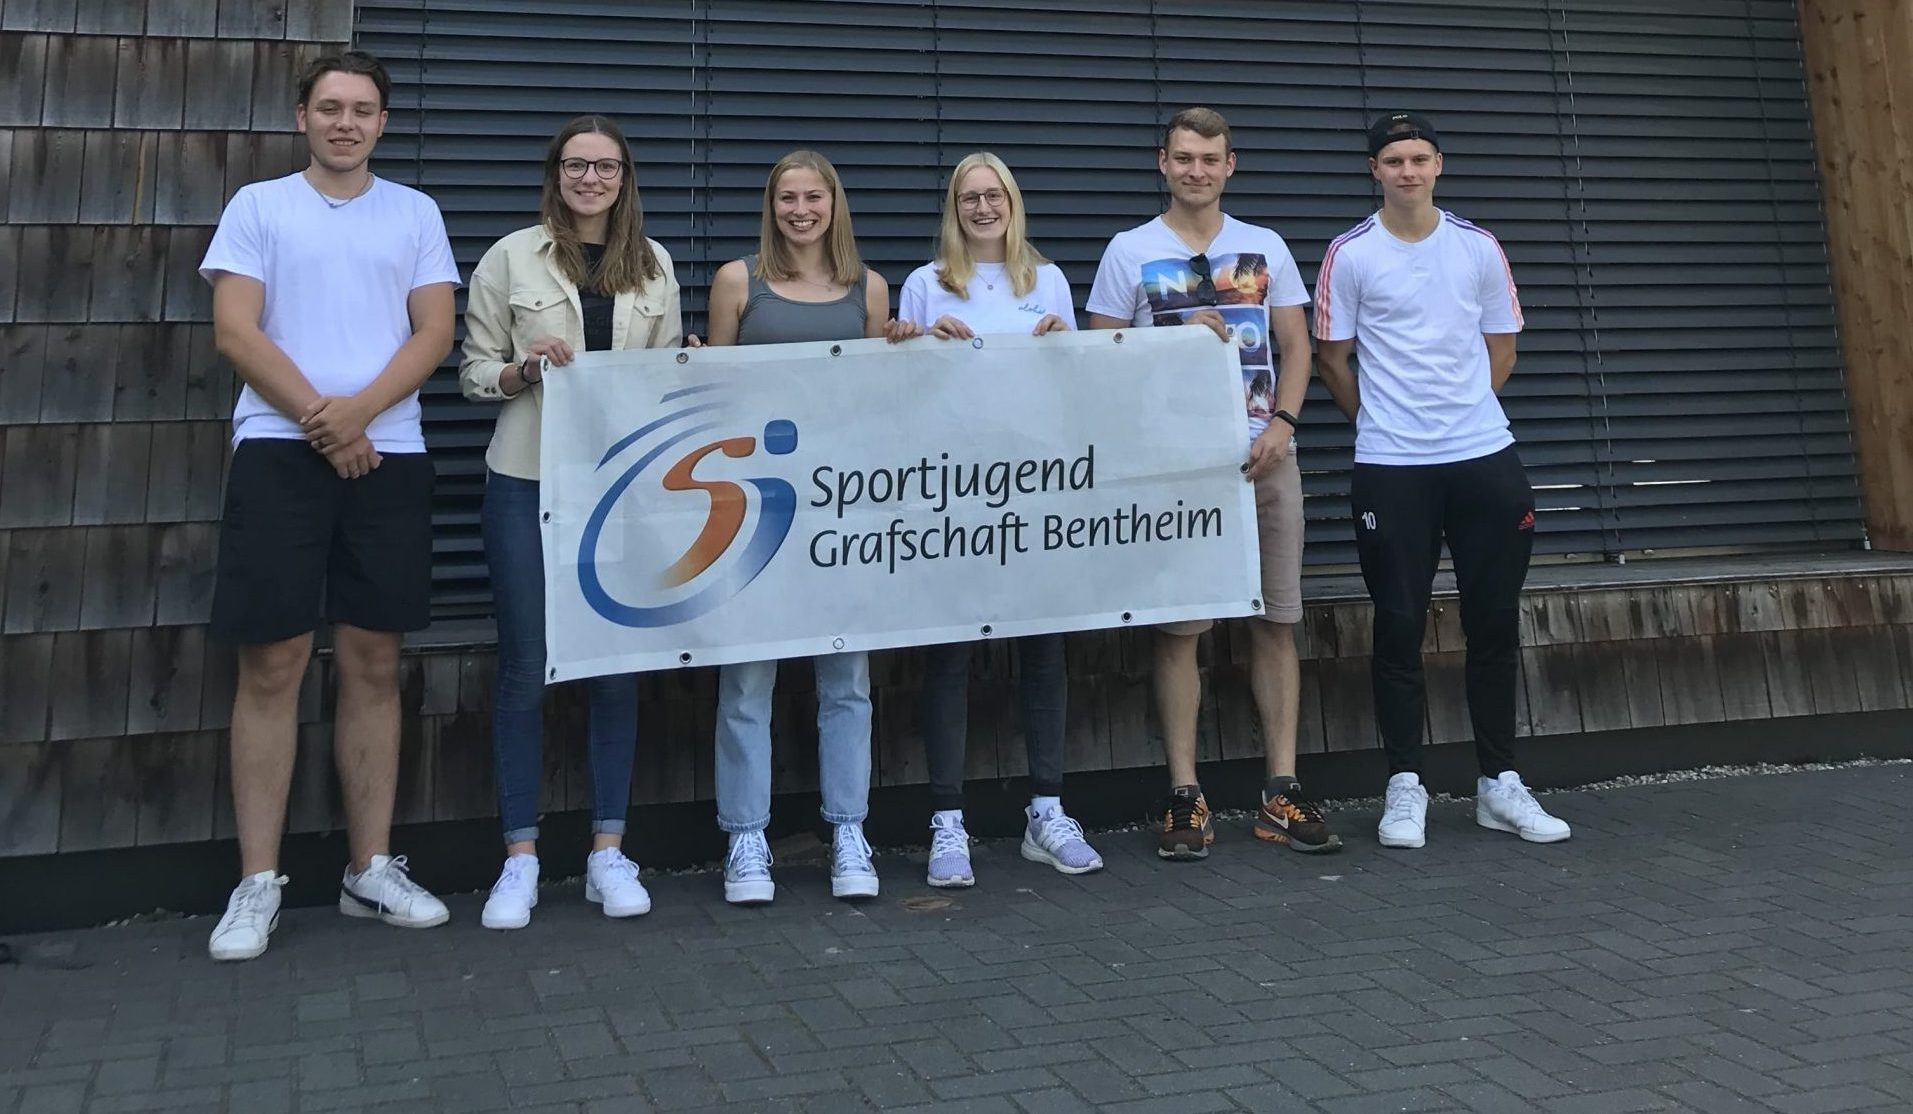 Sportjugend Vorstand tagt auf Langeoog